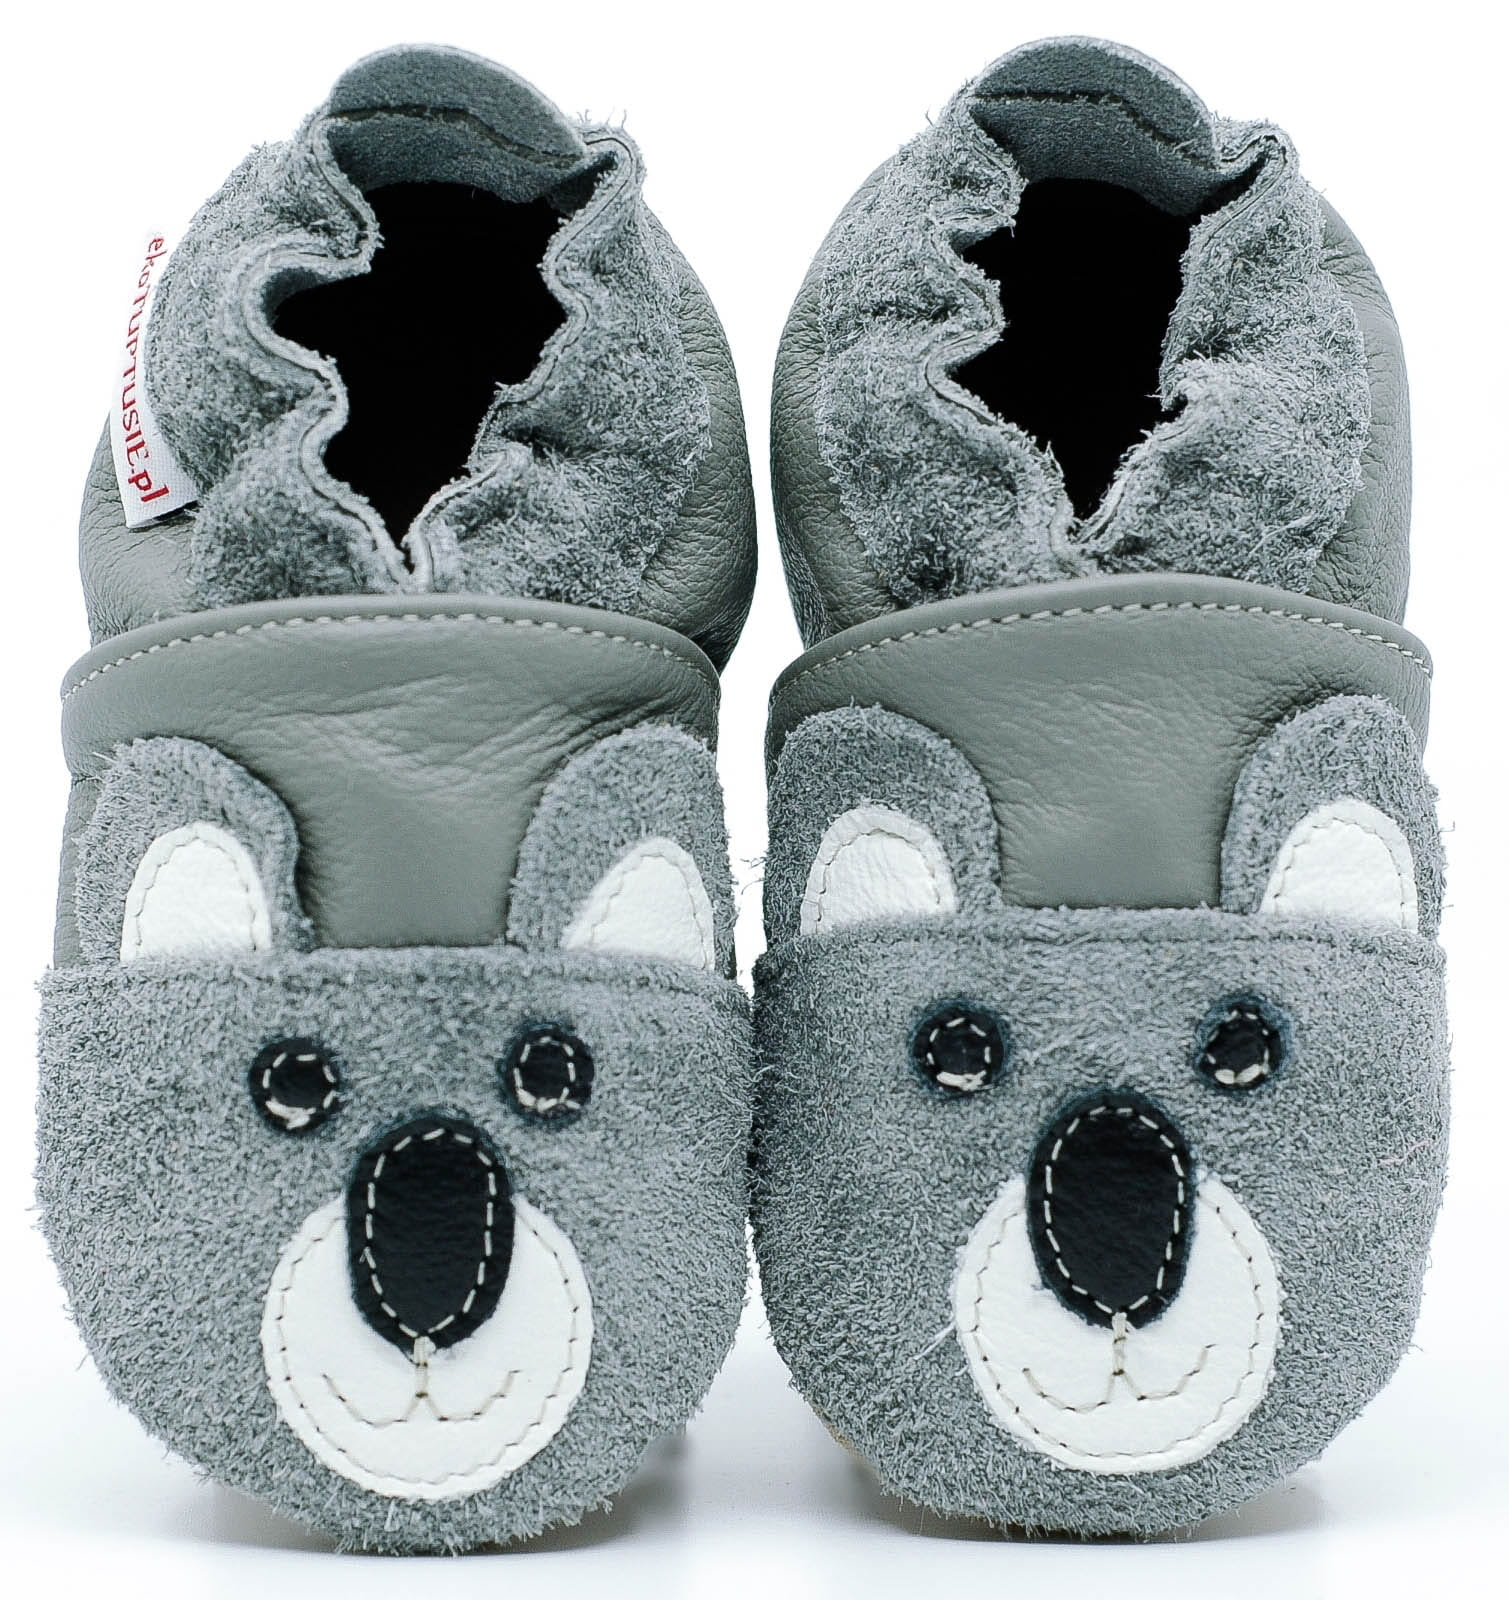 Soft Sole Baby Shoes KOALA FIORINO